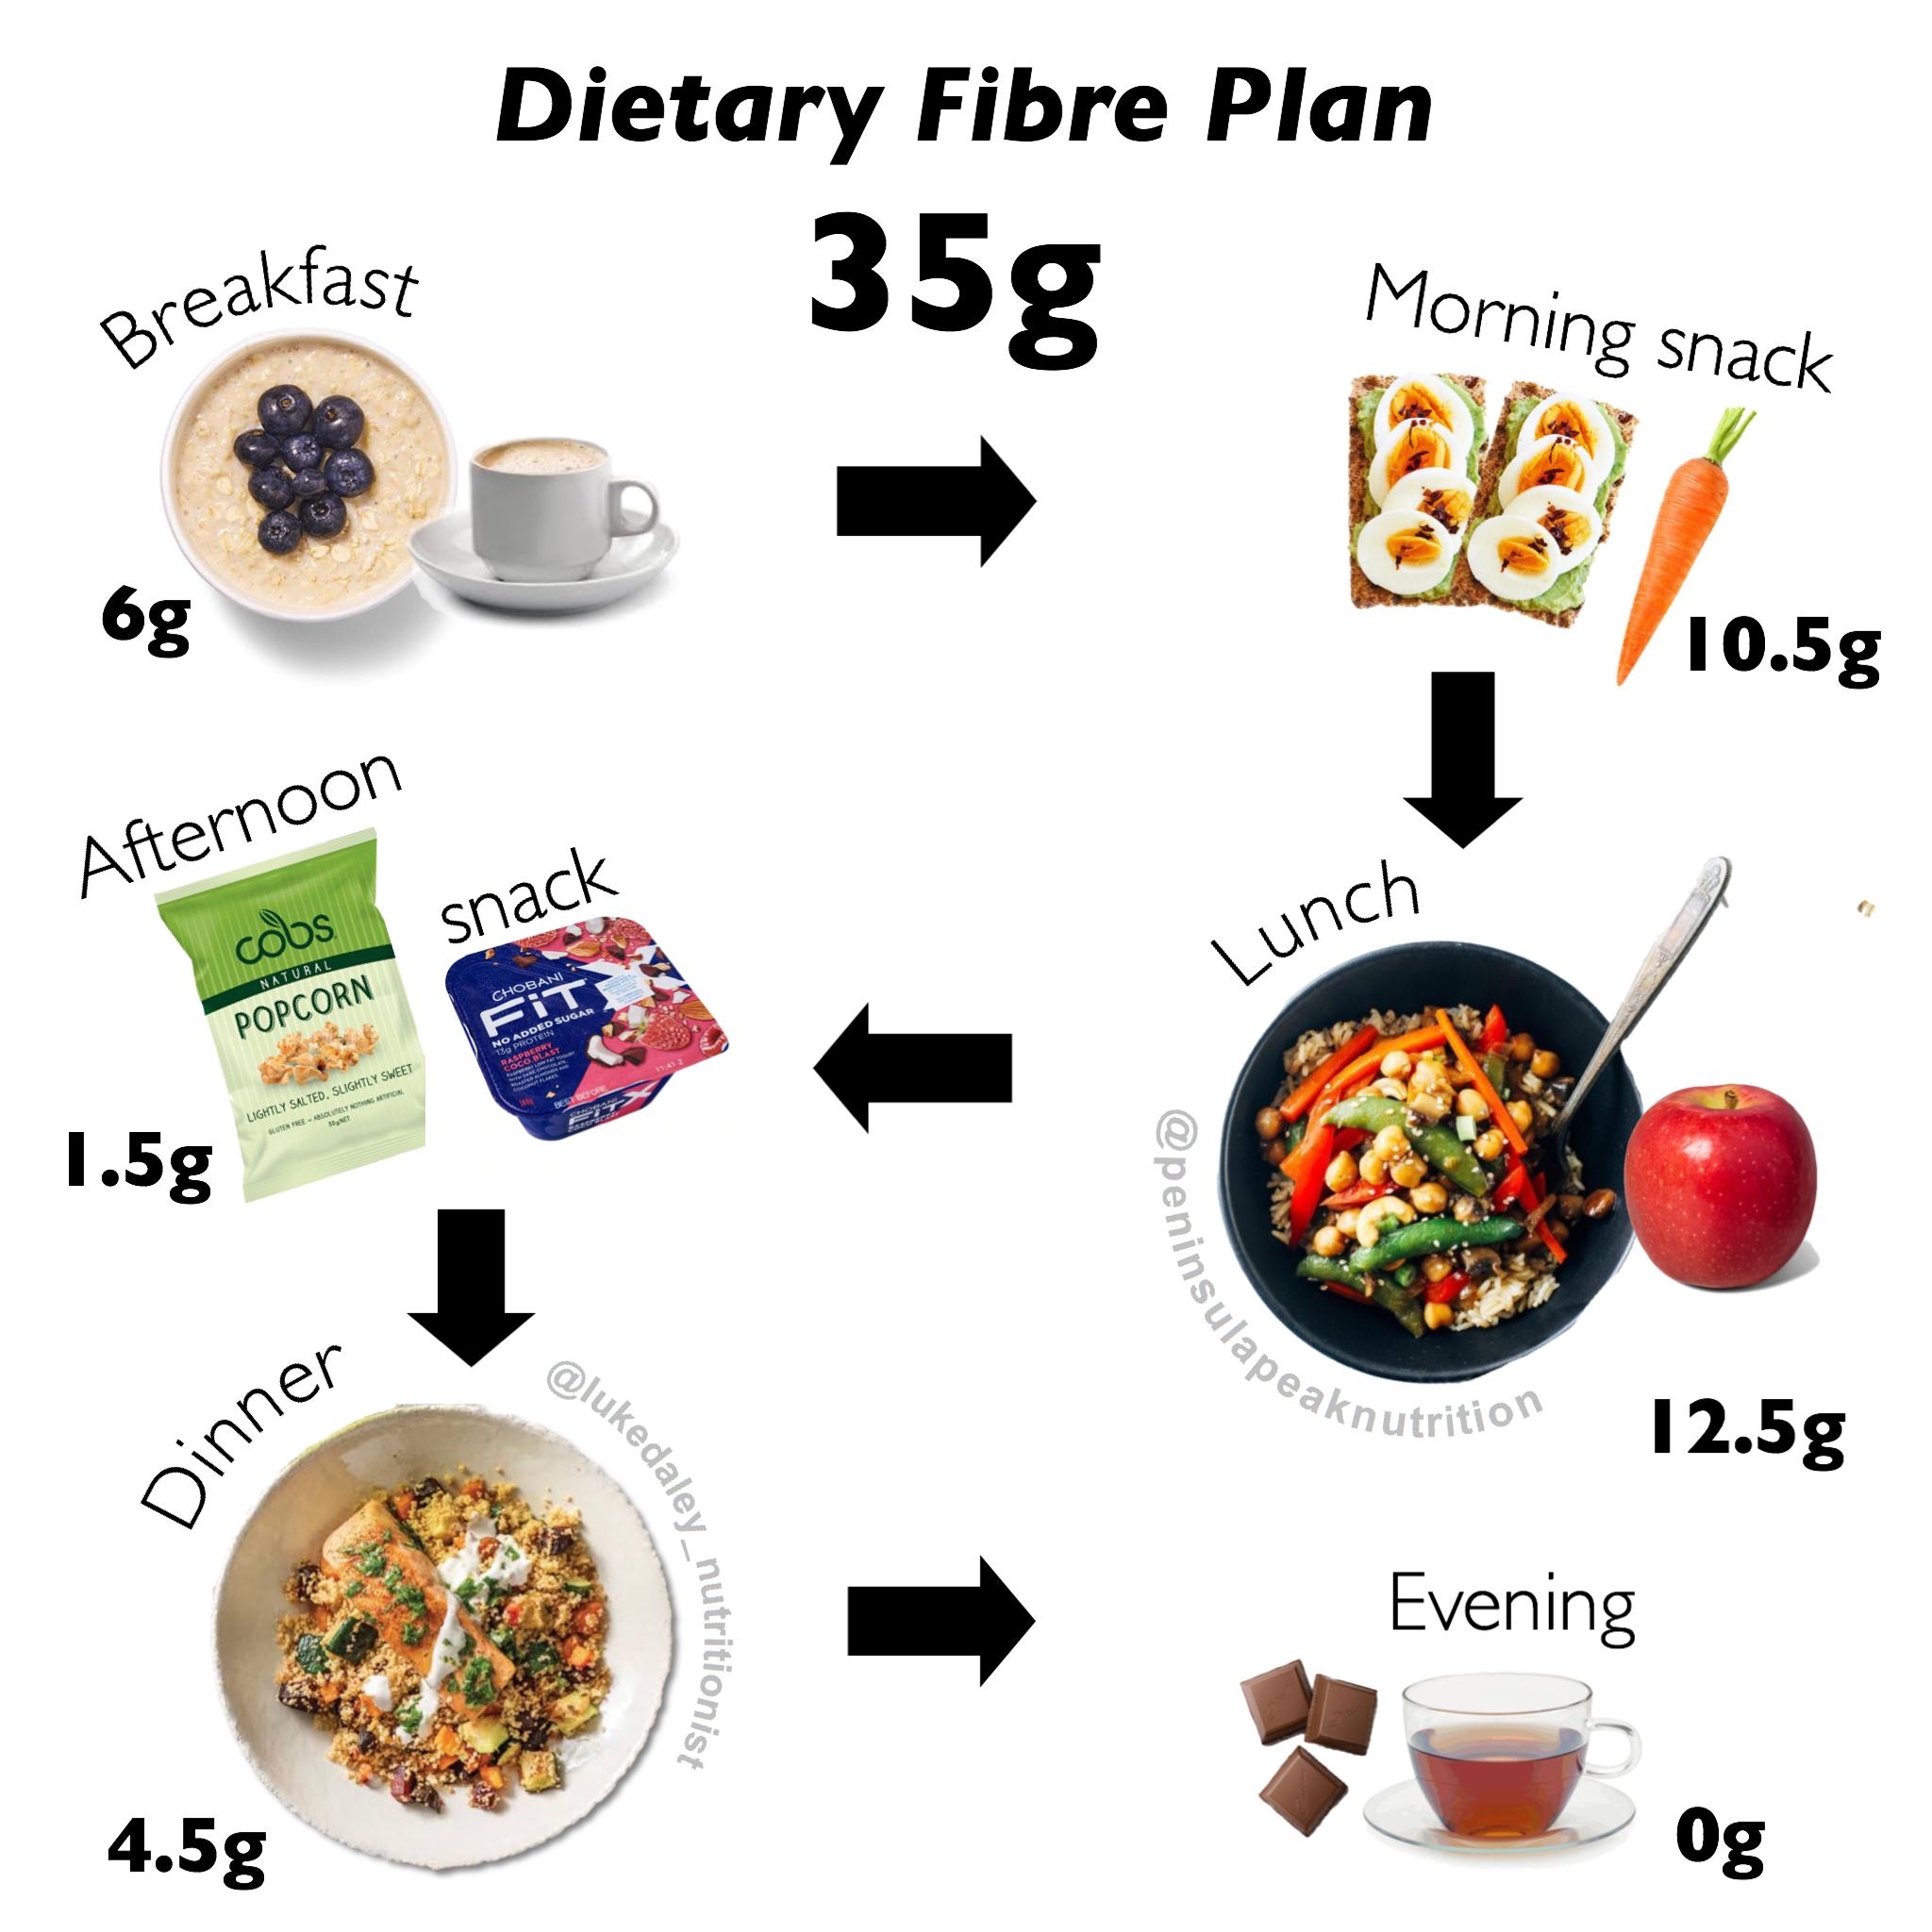 Dietary fibre intake